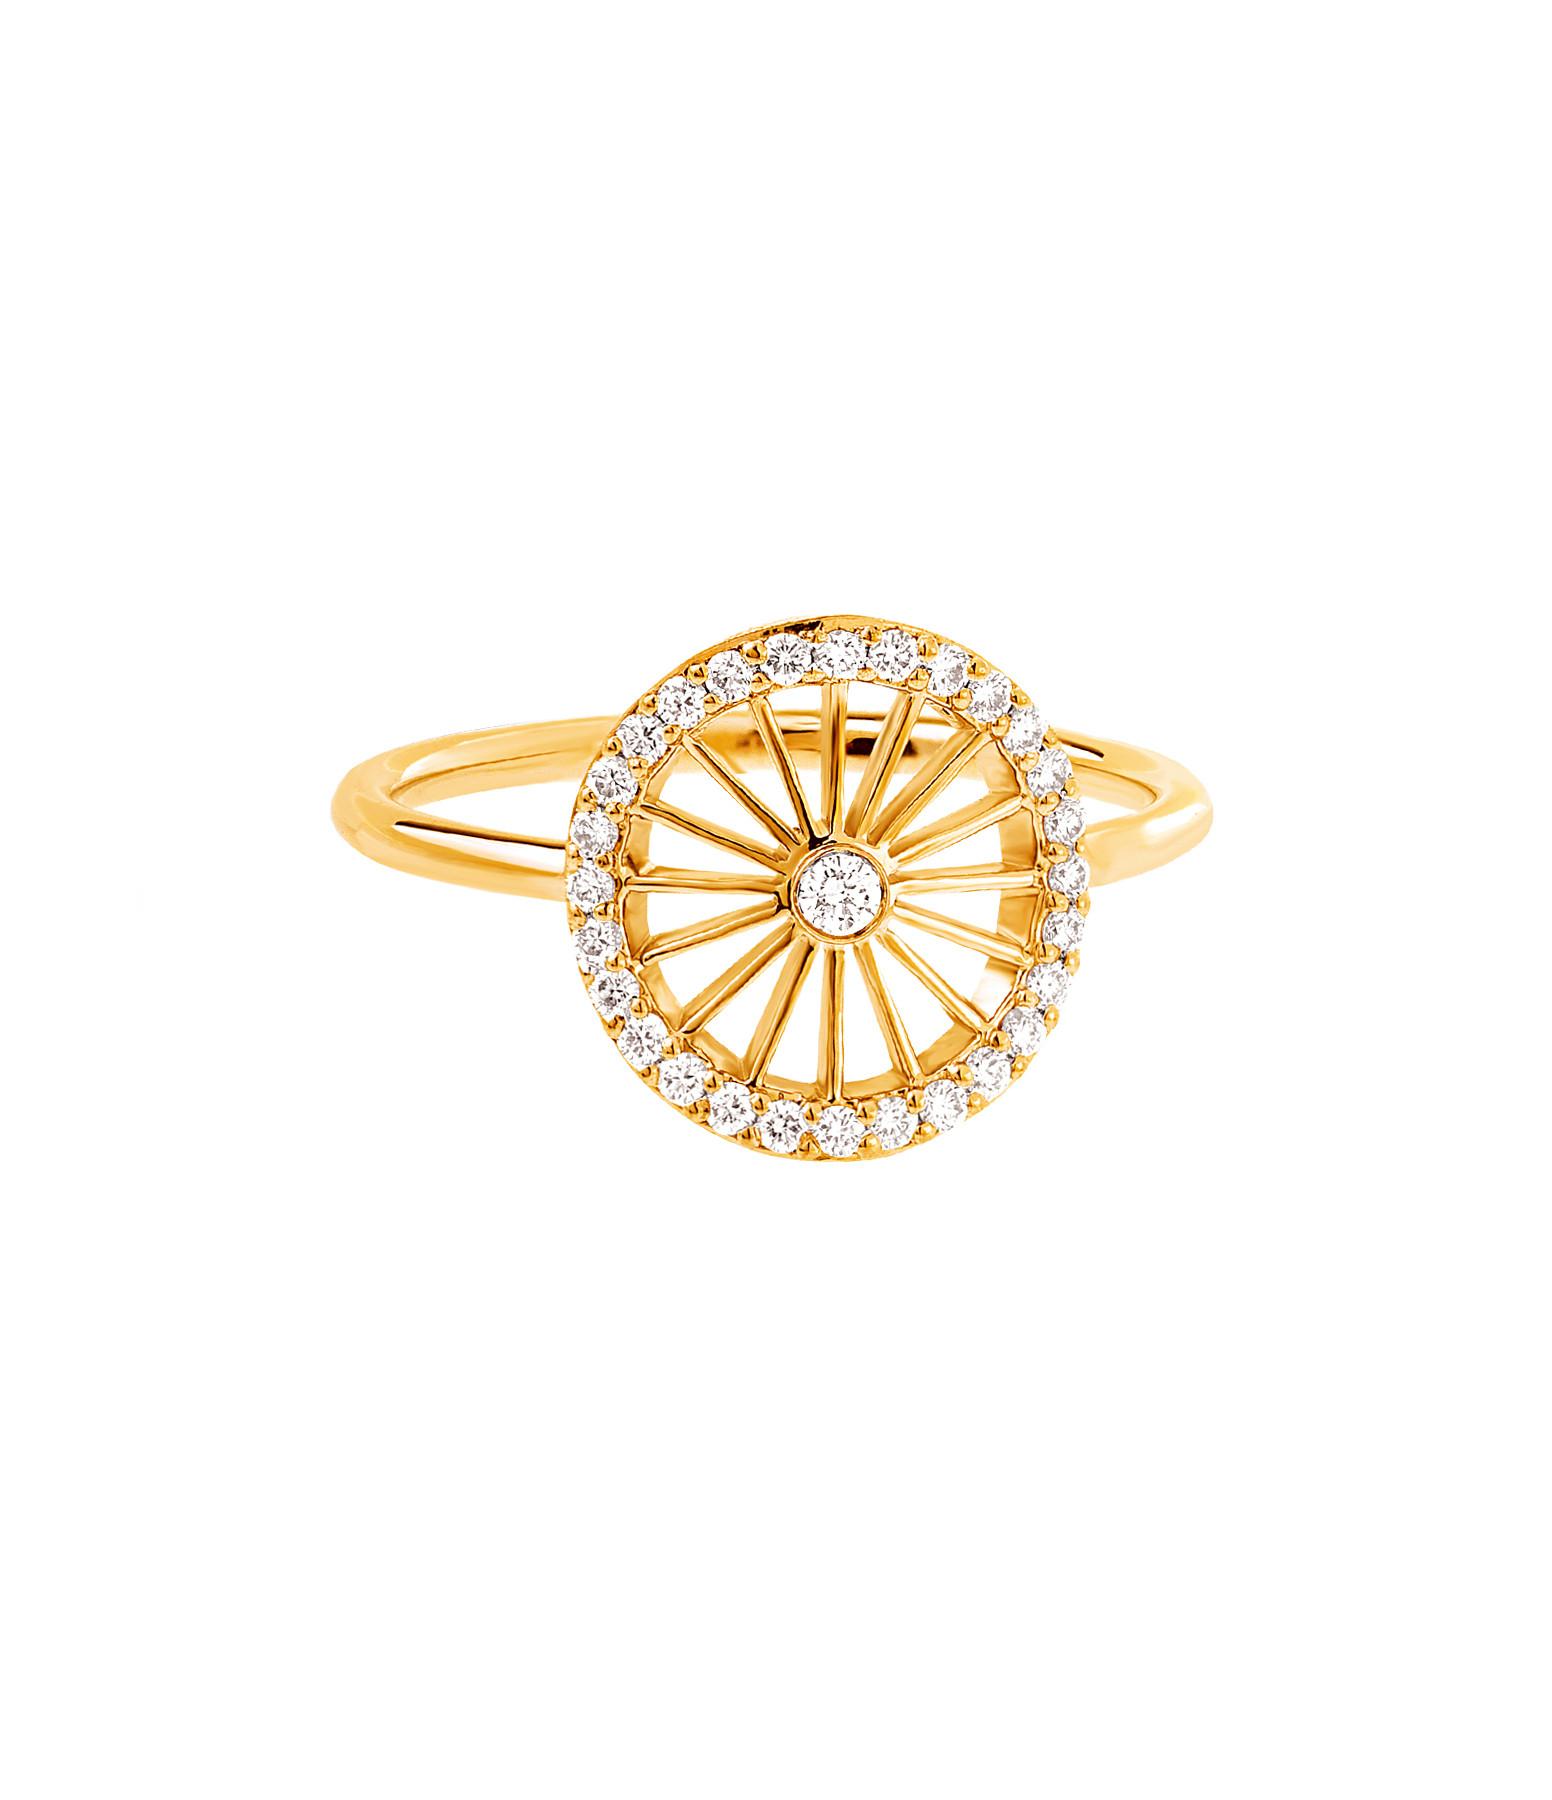 NAVA JOAILLERIE - Bague Cheyenne Ronde Diamants Or Jaune